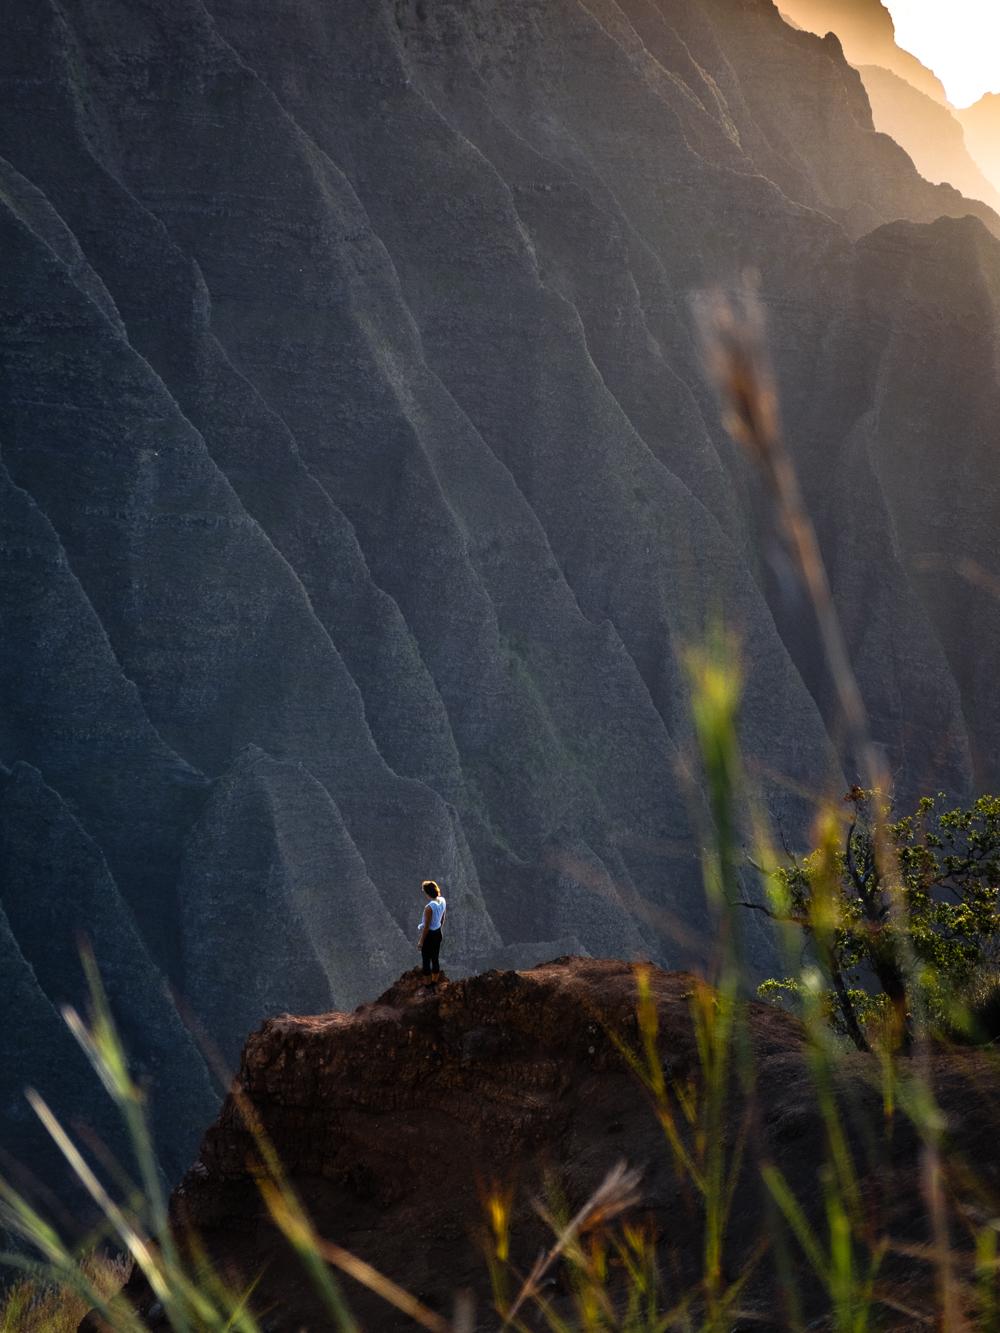 Kalalau_lookout-chelsea_yamase-@chelseakauai-Cookwilltravel-Kauai.jpg